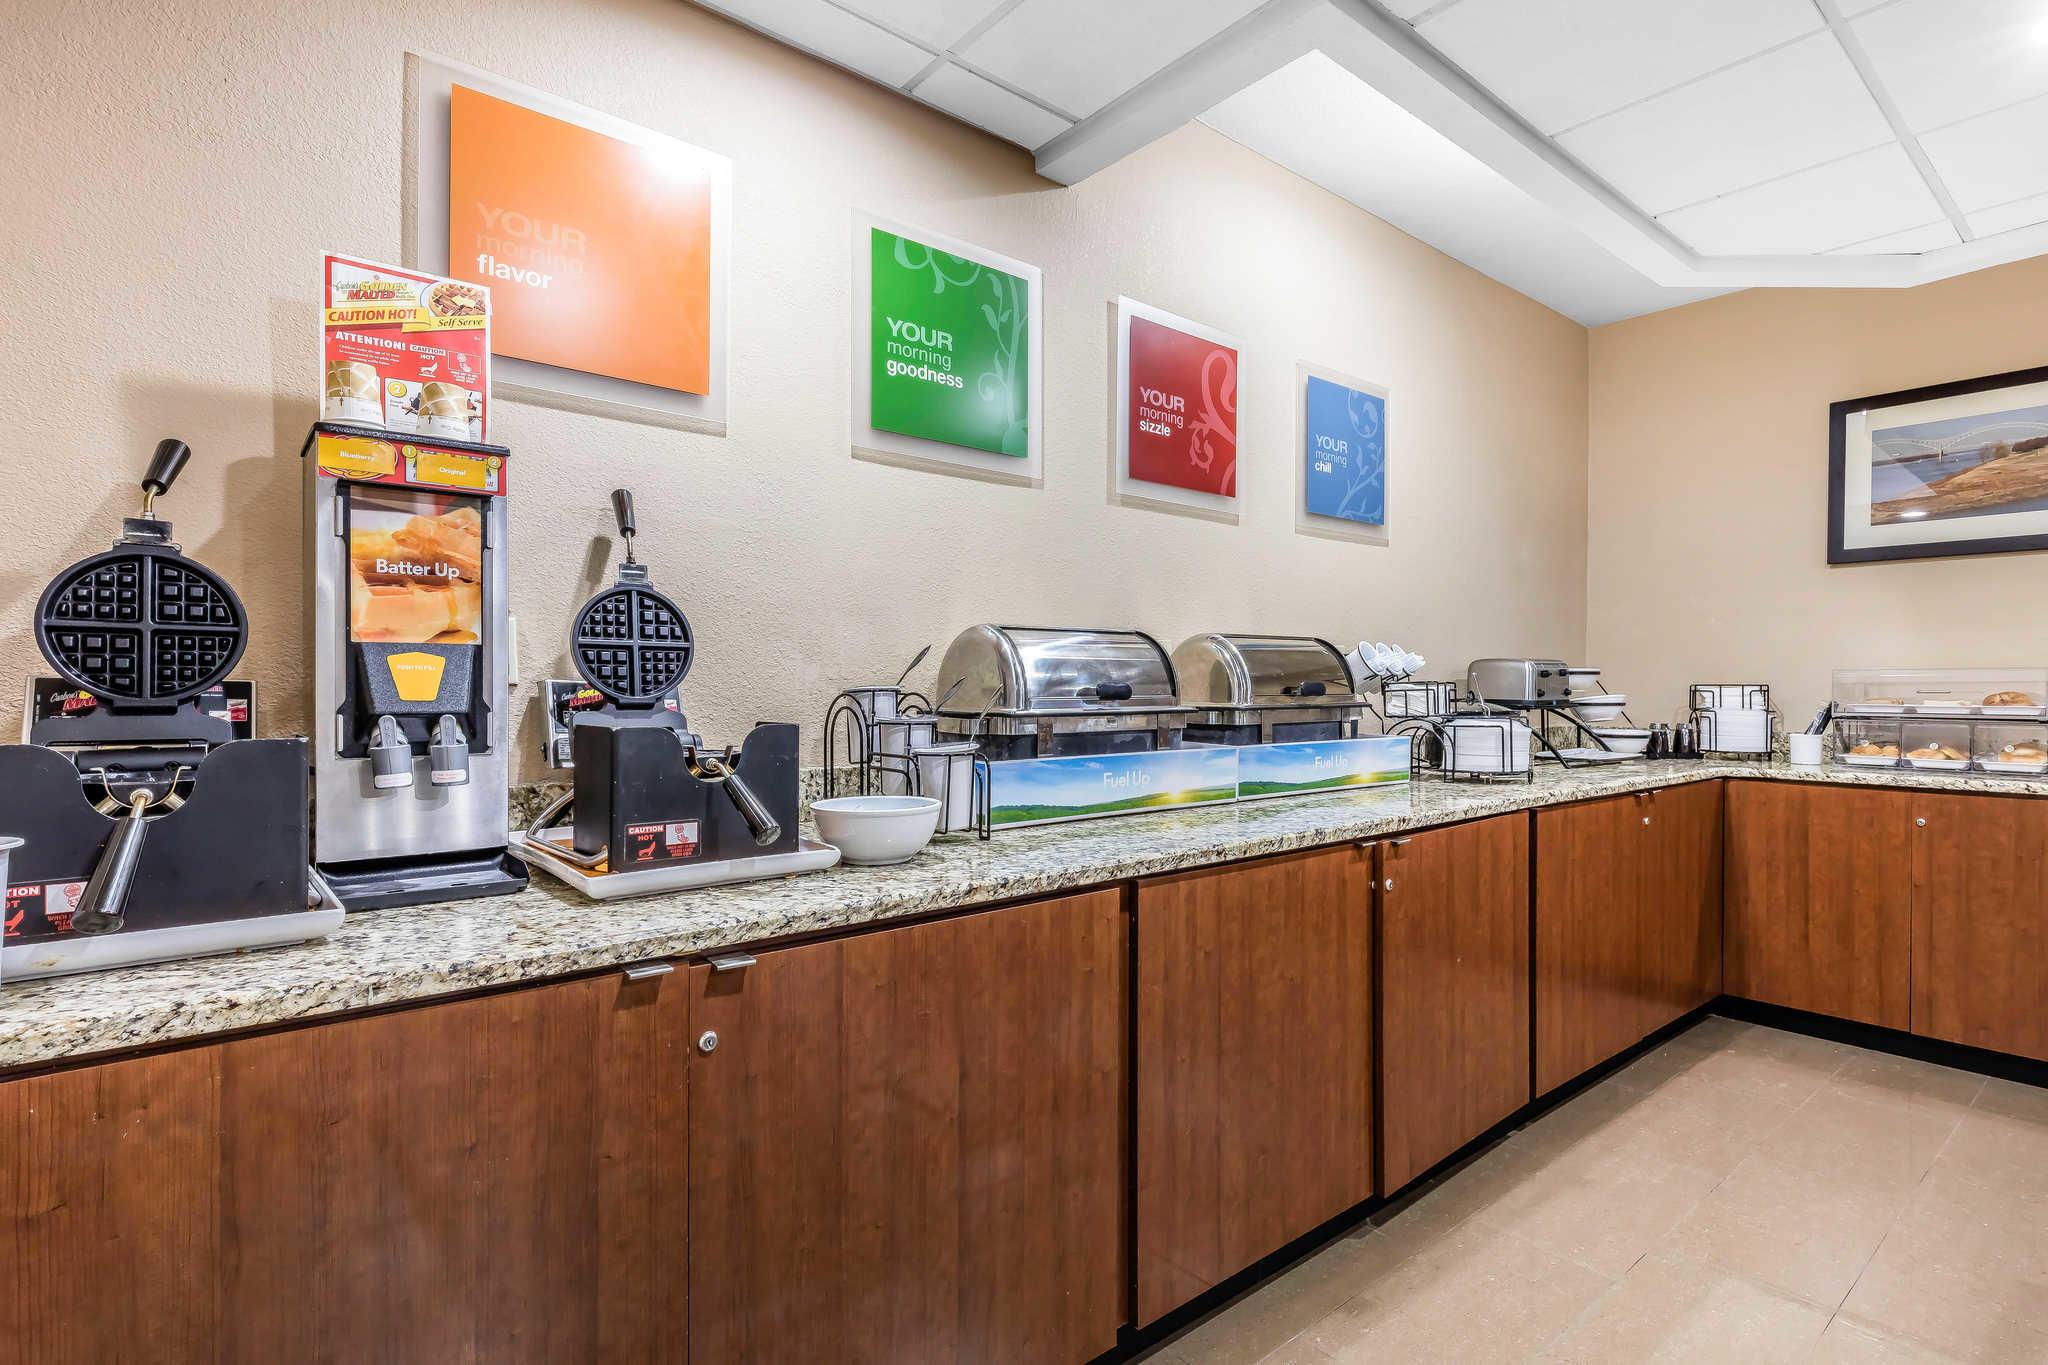 Comfort Inn & Suites Airport-American Way image 19